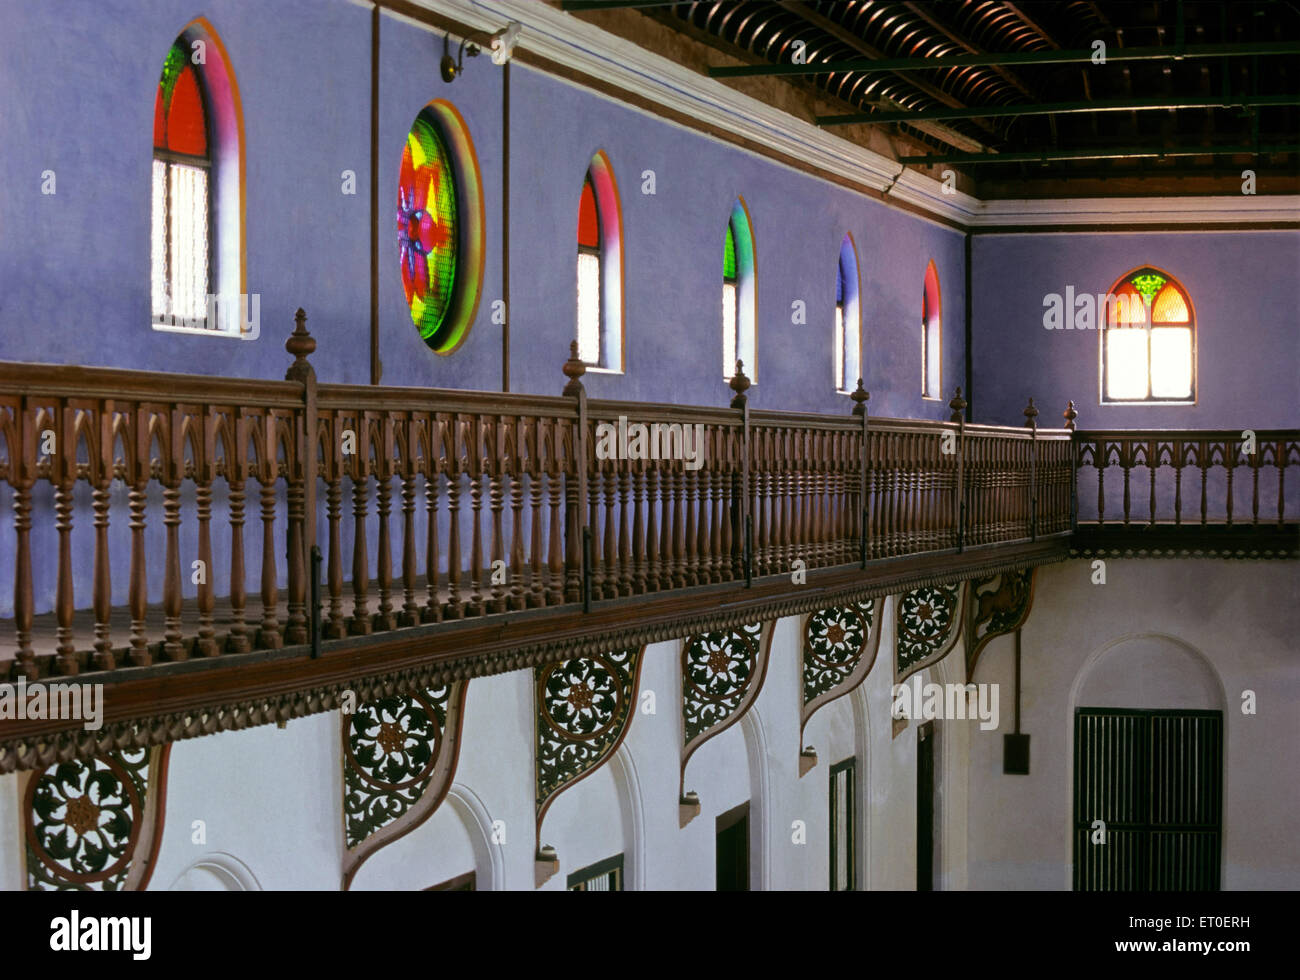 ornately railed corridor runs hall height protects access array painted windows stream Chettinad Tamil Nadu - Stock Image